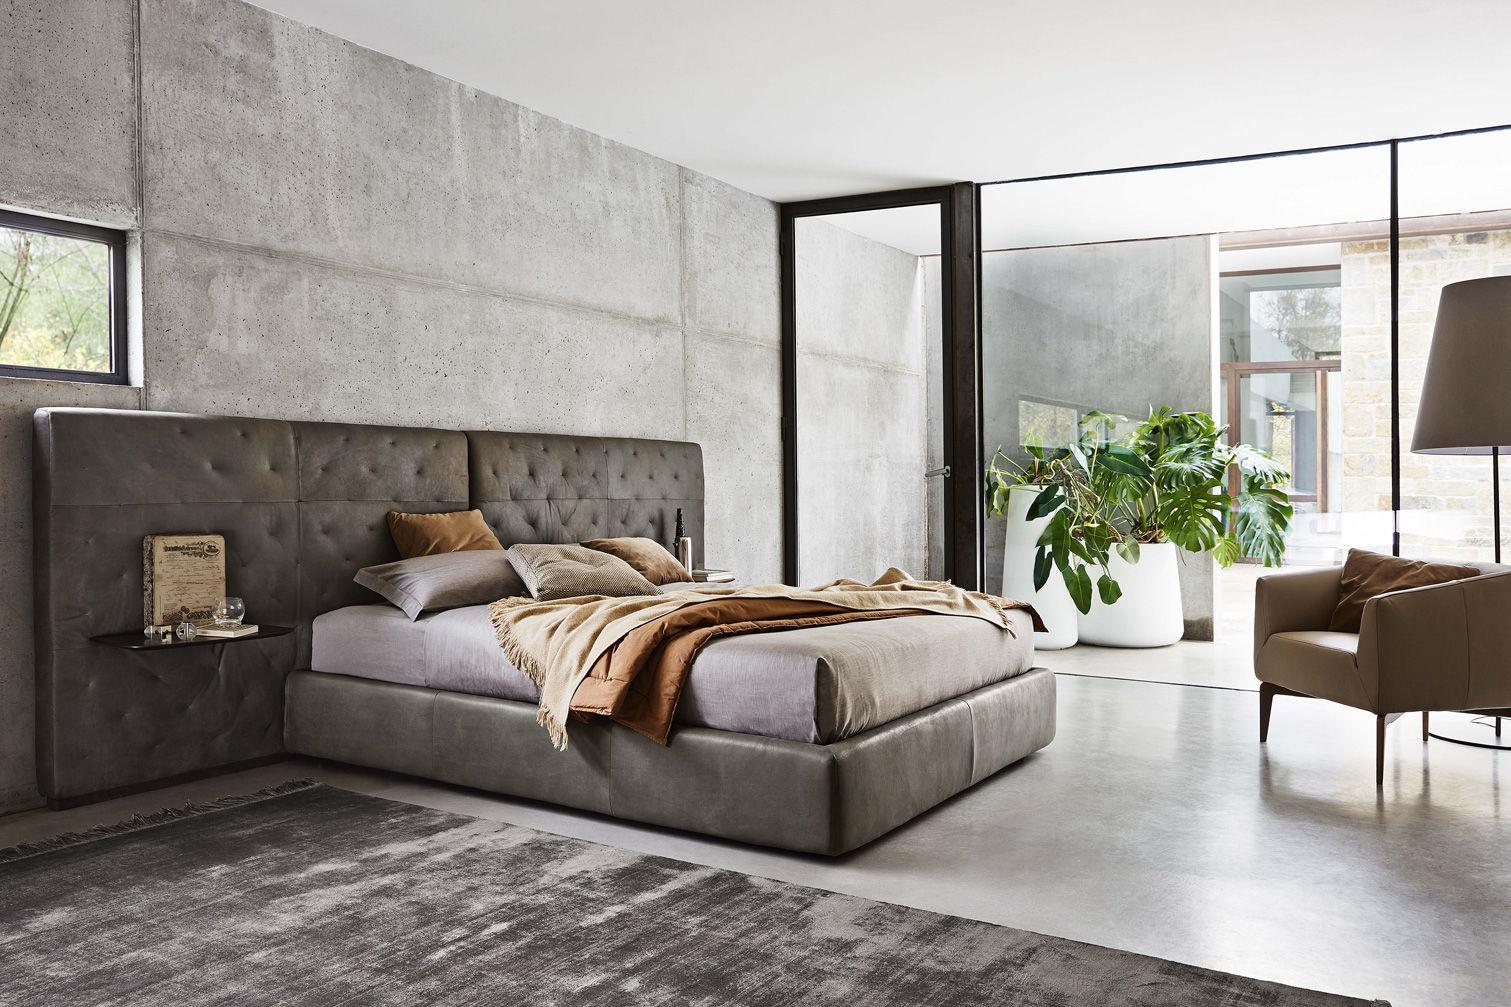 Standardbett / Doppelt / Modern / Stoff   ECLECTICO By Spessotto U0026 Agnoletto